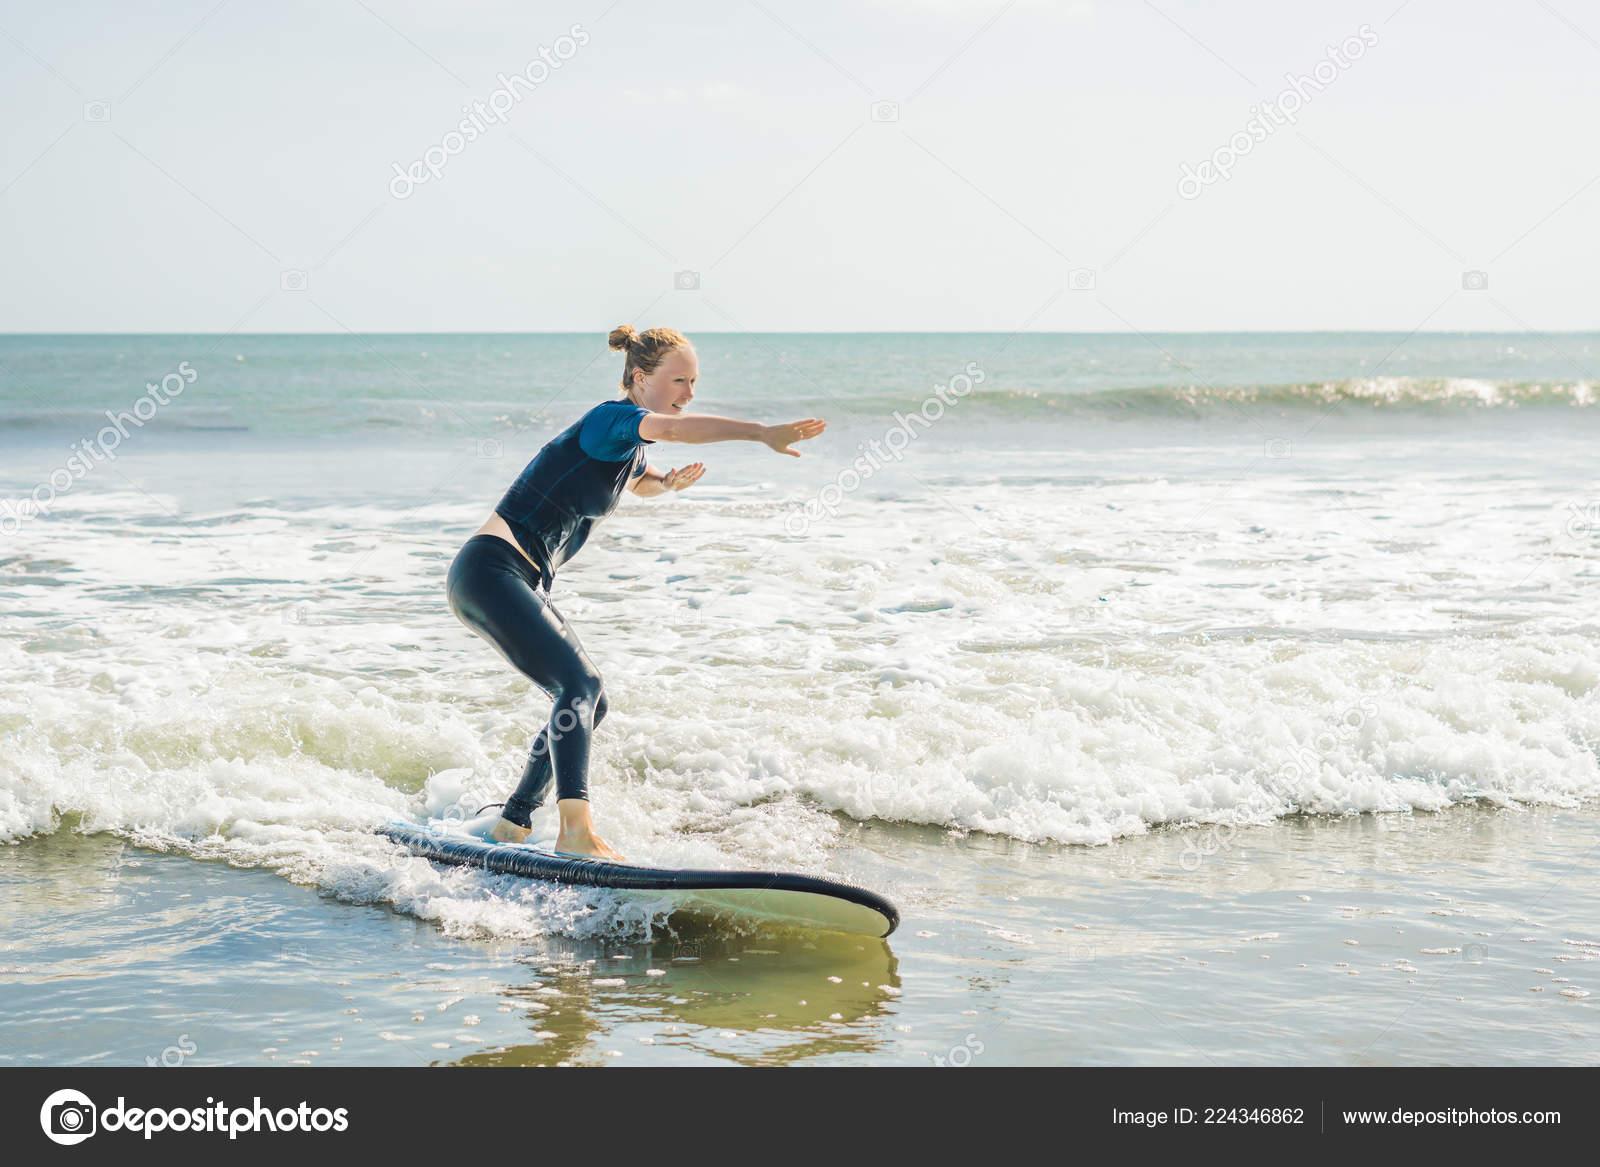 Joyeuse Jeune Femme Surfant Avec Planche Surf Bleu Novice Sur Photographie Galitskaya C 224346862